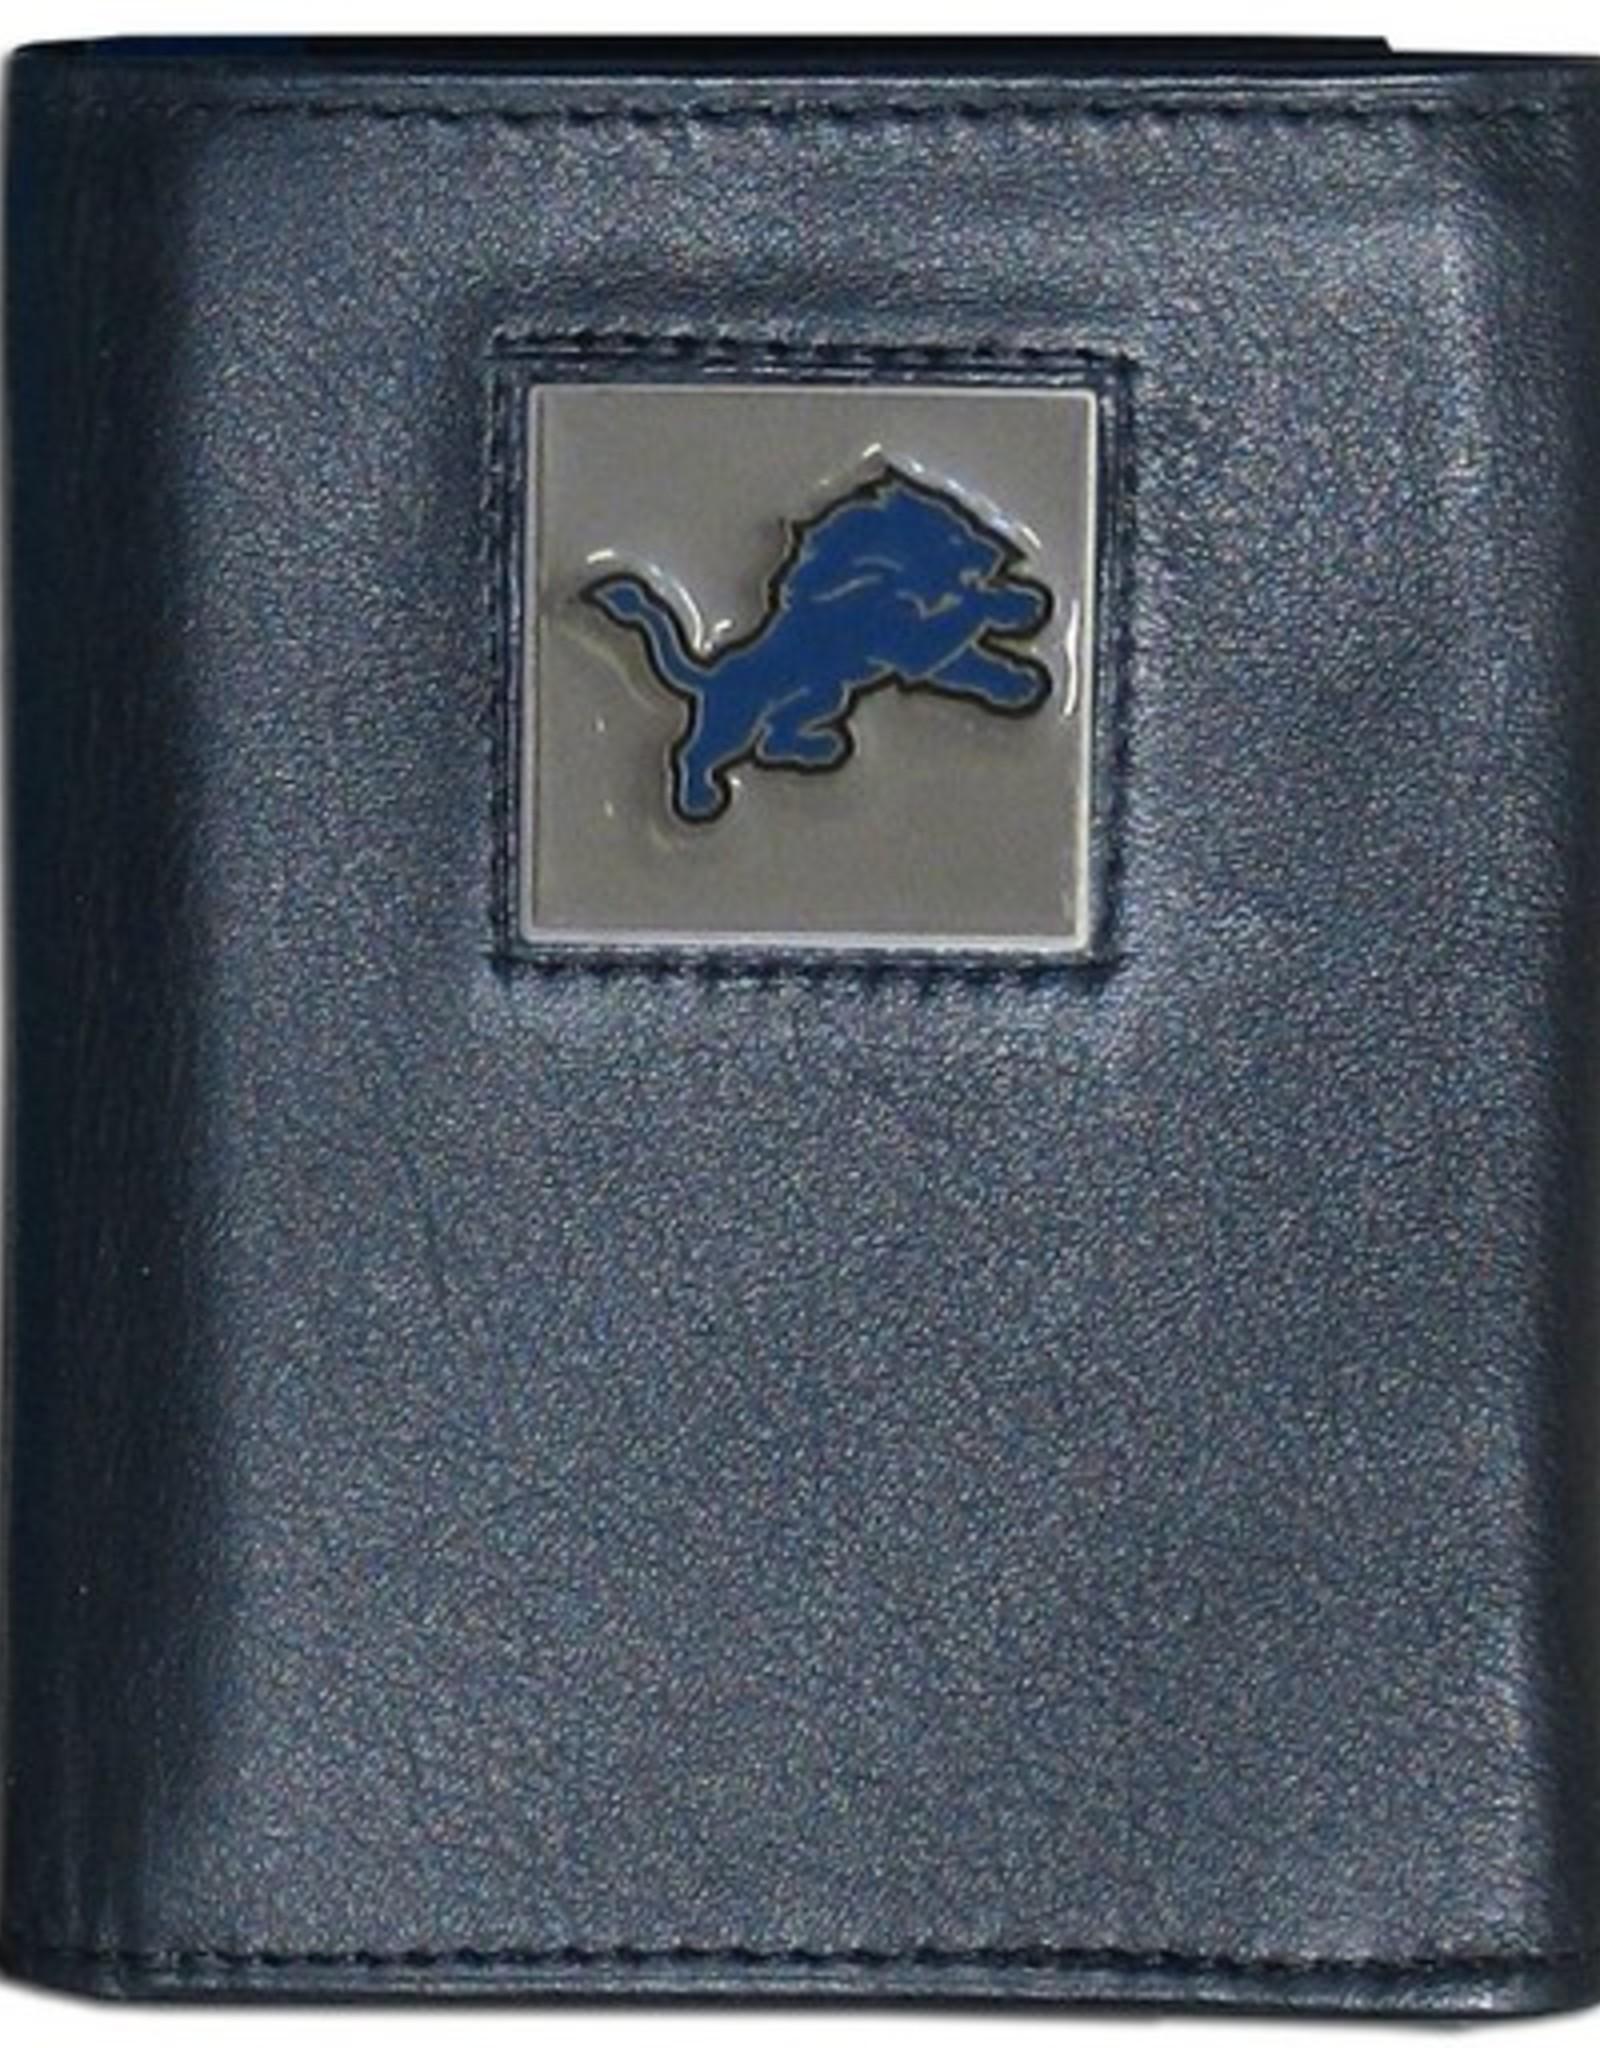 Detriot Lions Executive Black Leather Trifold Wallet